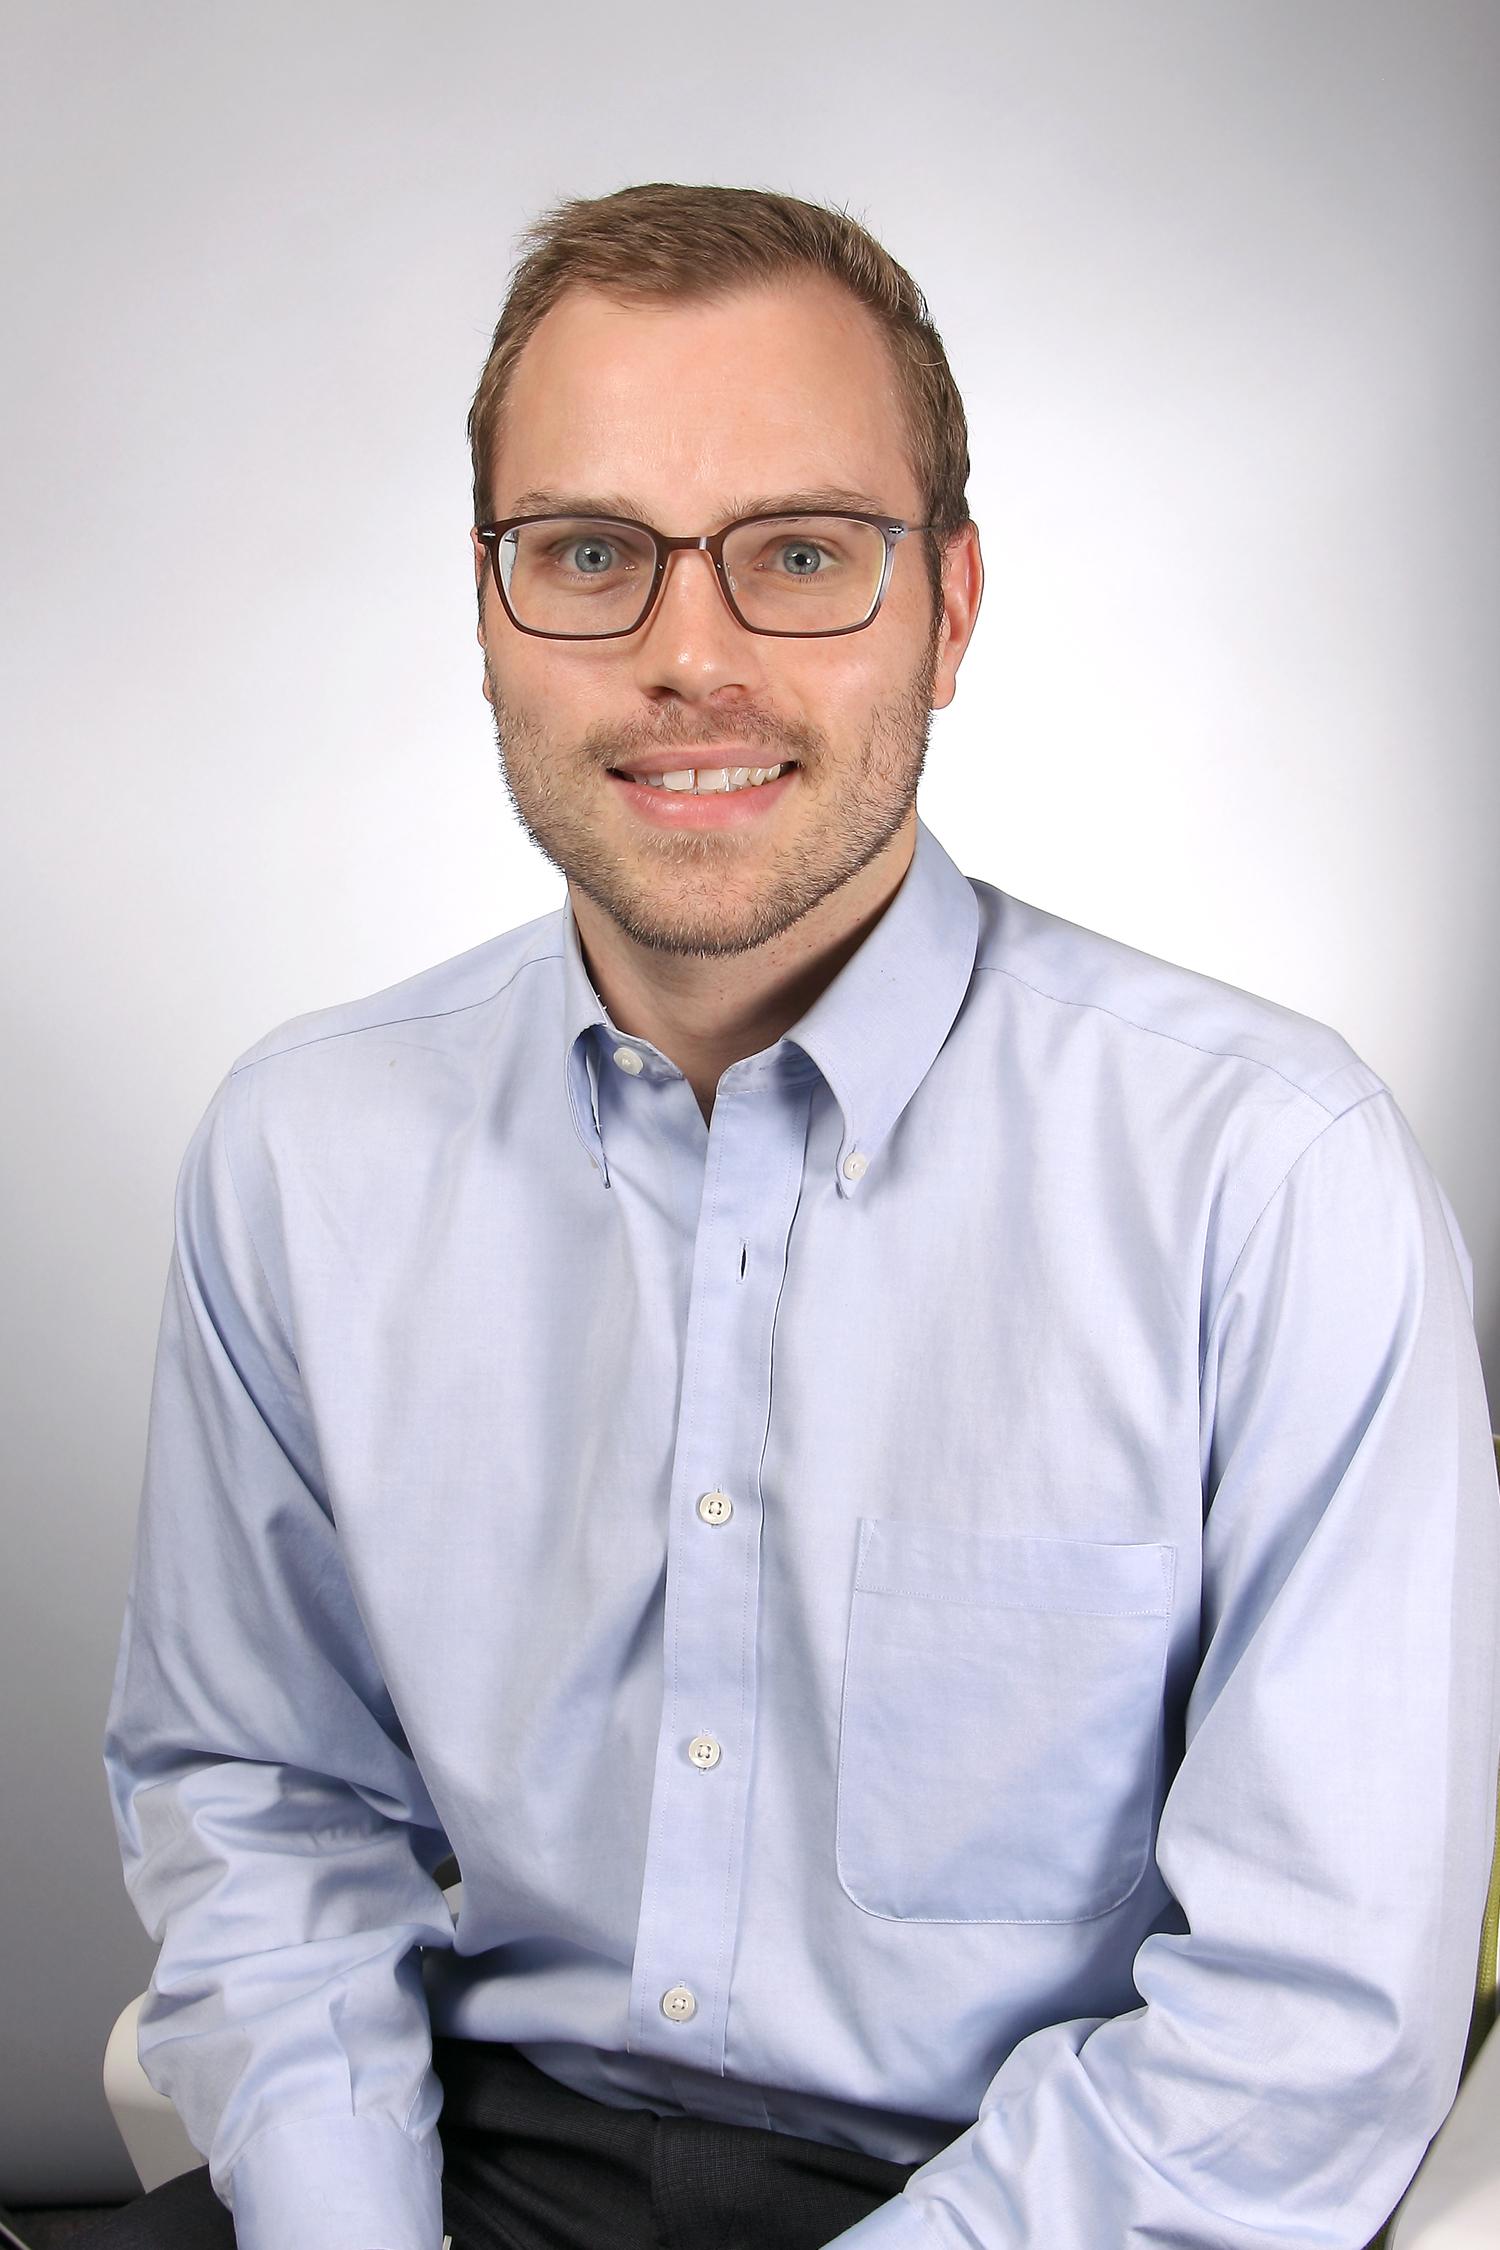 Michael Patton, GS-1